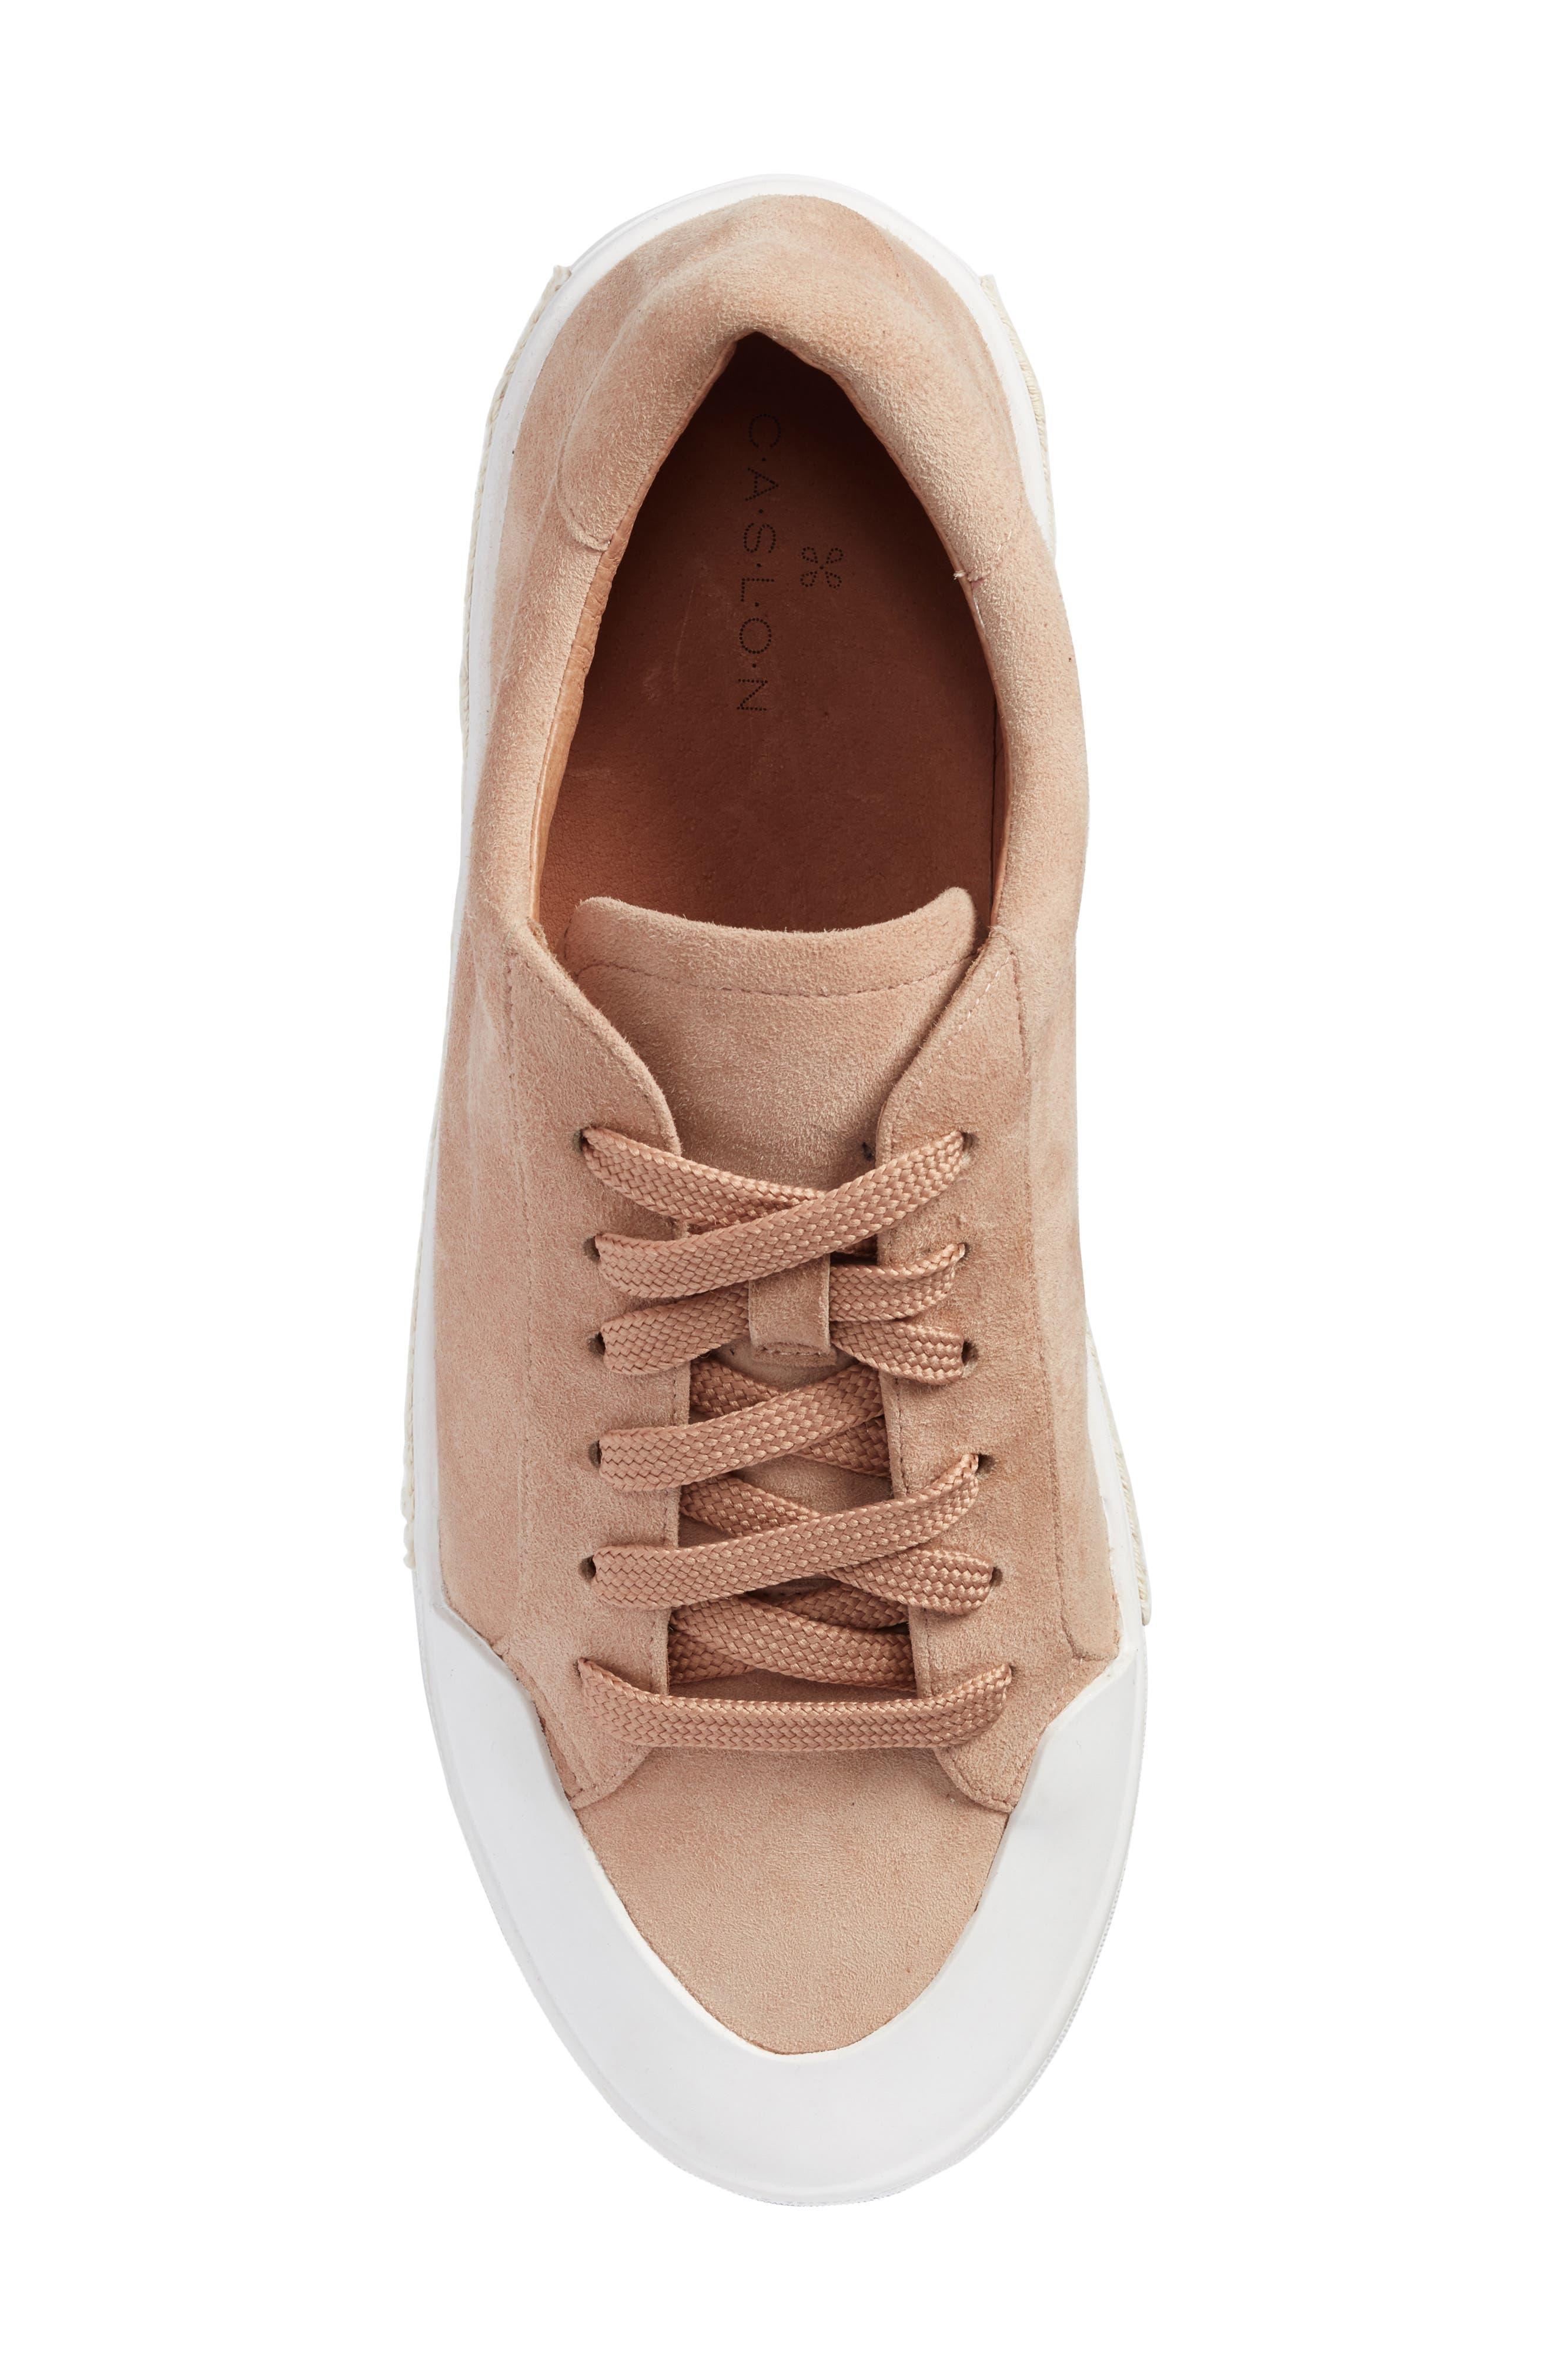 Toran Platform Sneaker,                             Alternate thumbnail 5, color,                             Blush Suede